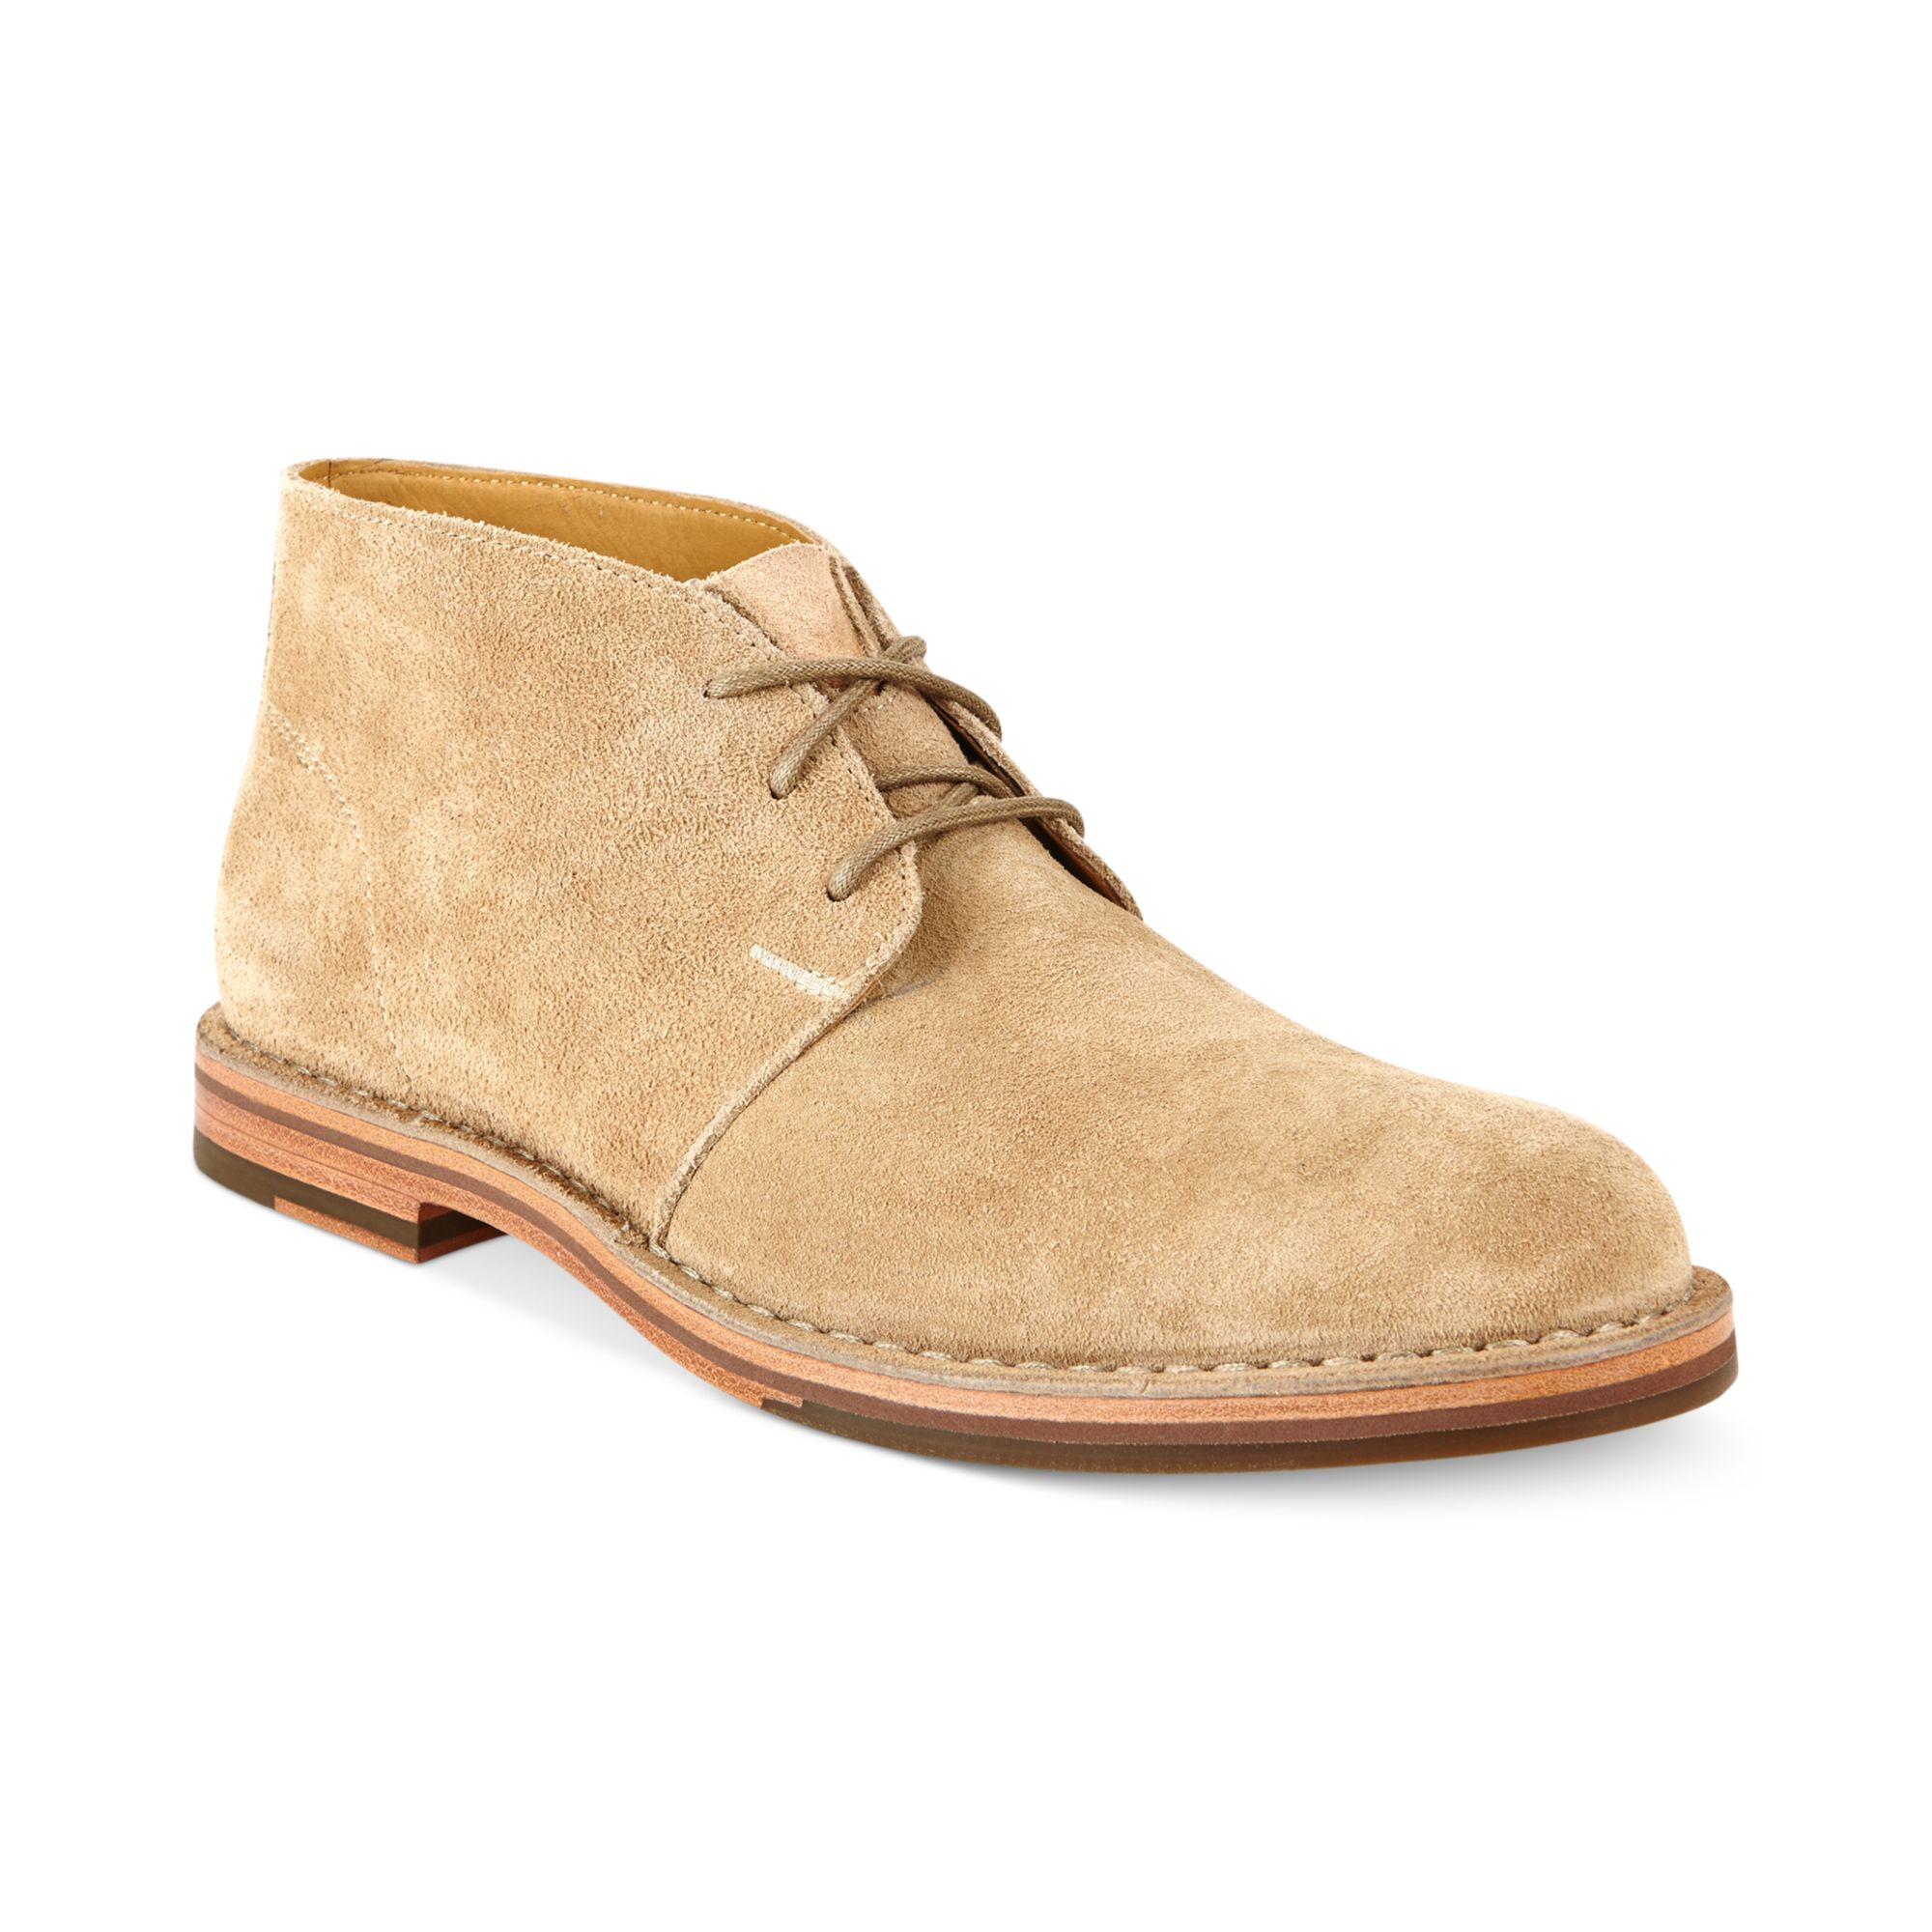 cole haan glenn chukka boots in beige for milkshake